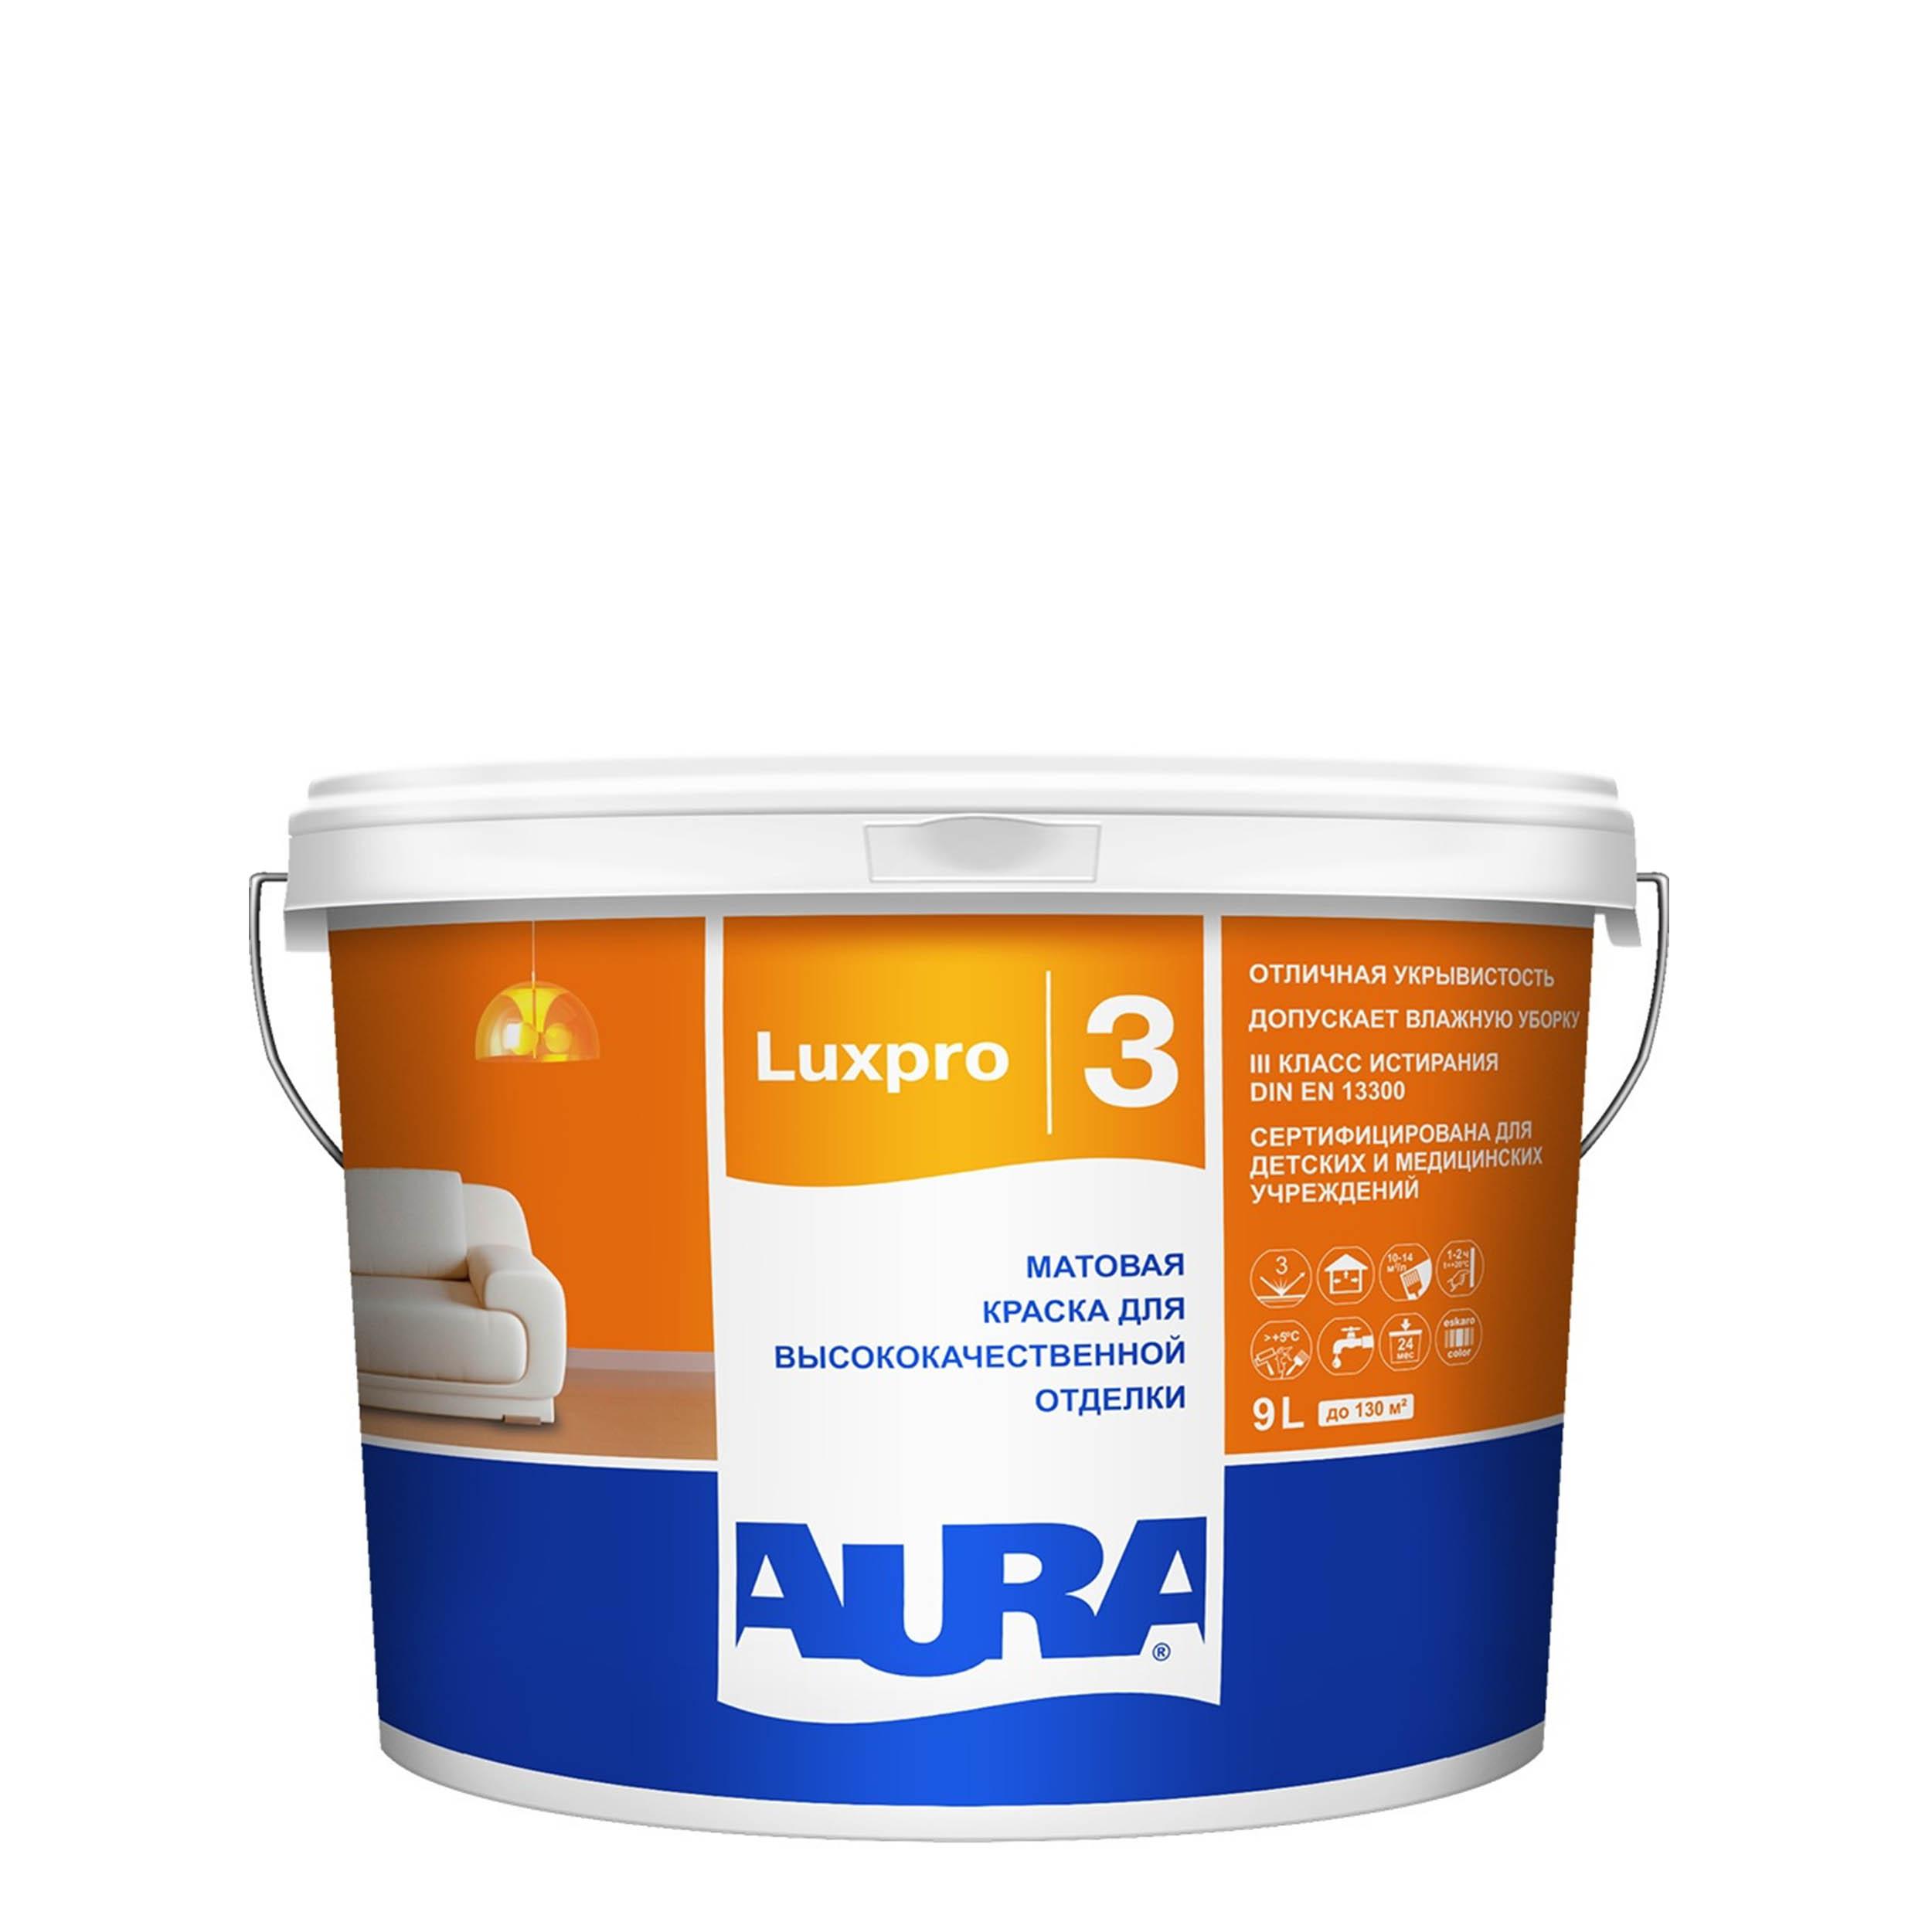 Фото 13 - Краска интерьерная, Aura LuxPRO 3, RAL 1015, 11 кг.